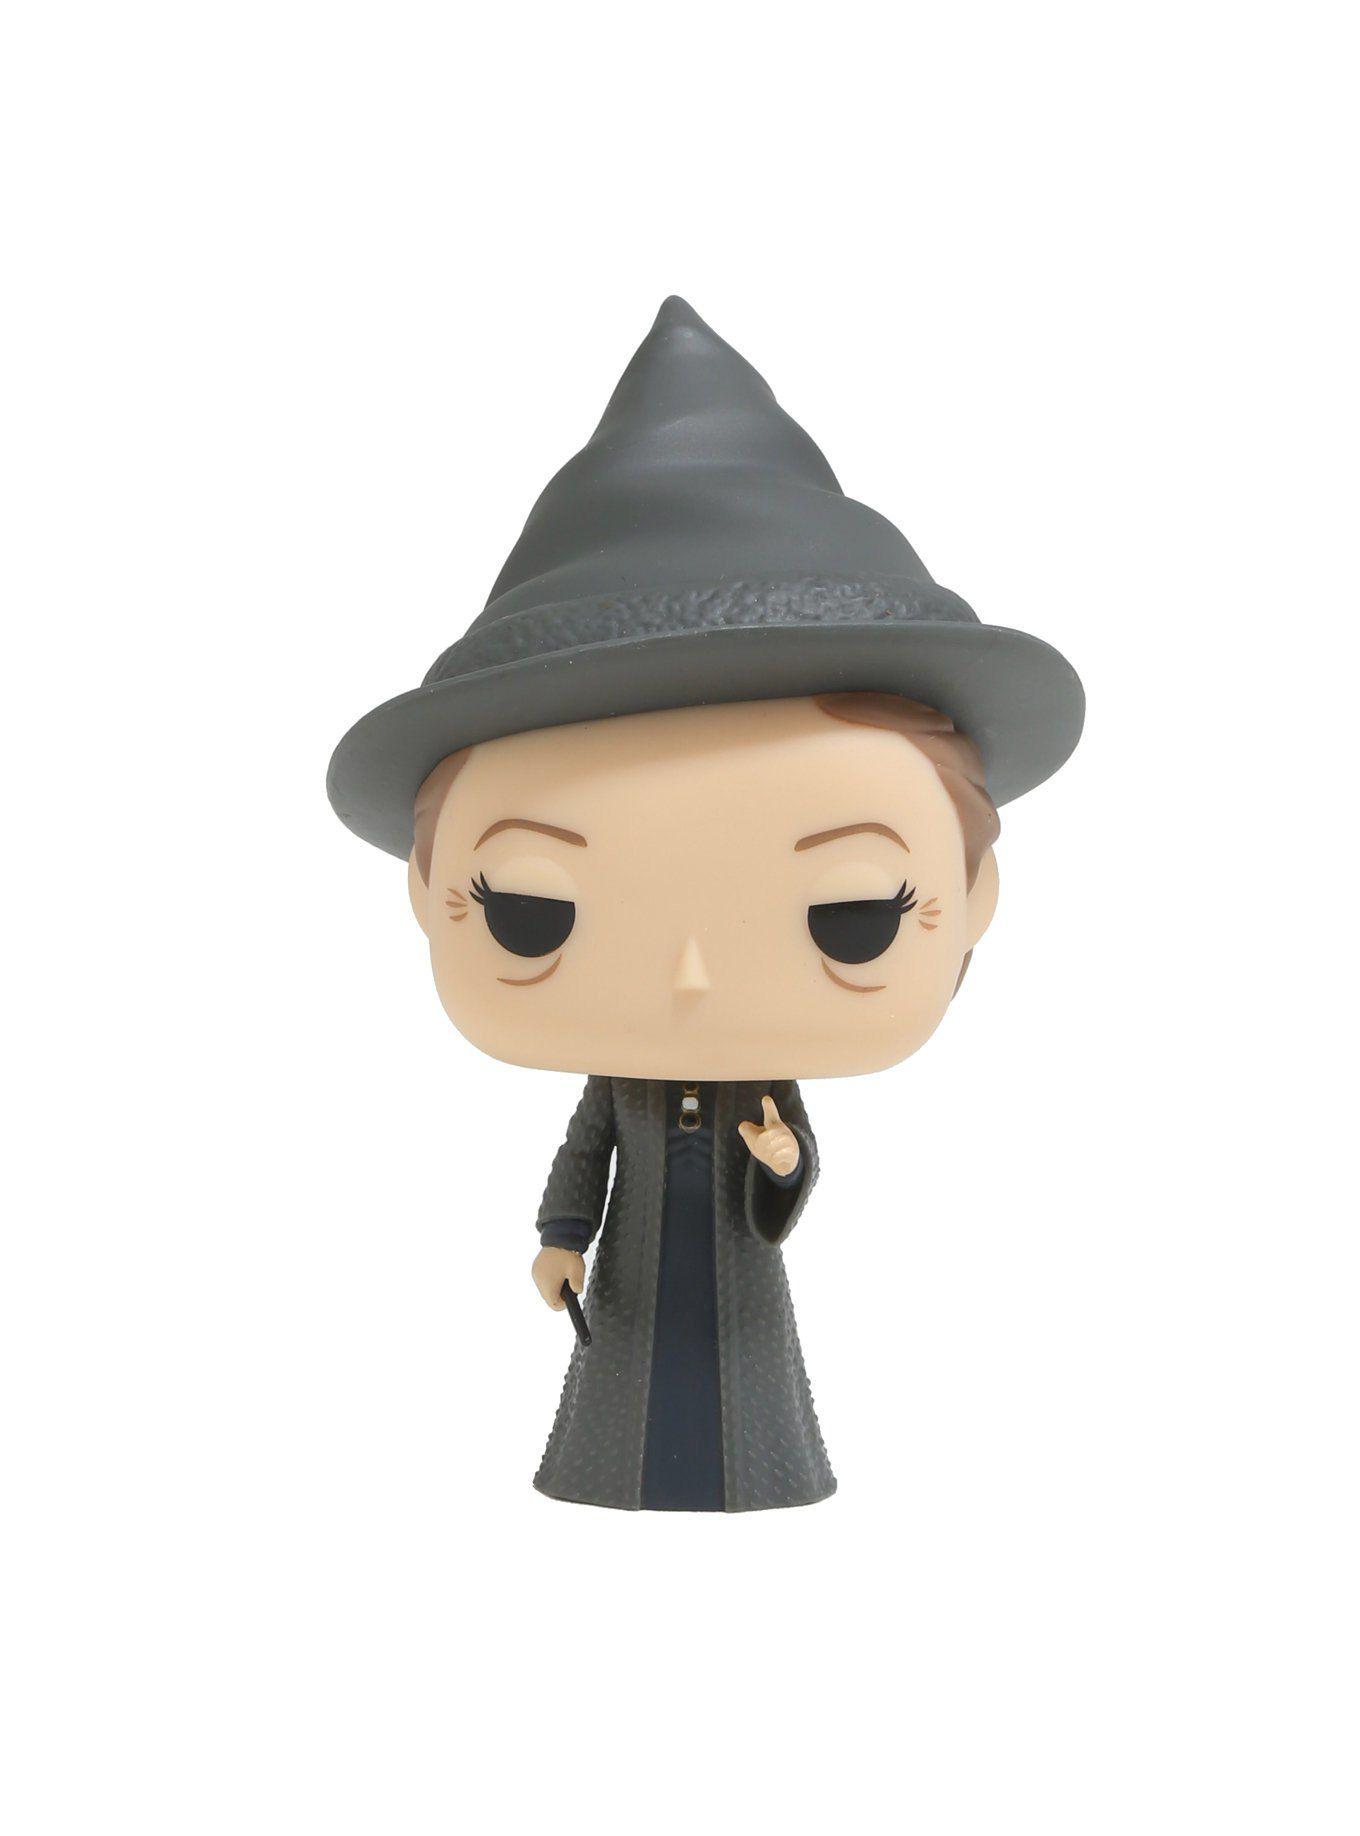 Minerva McGonagall #37 - Harry Potter - Funko Pop!